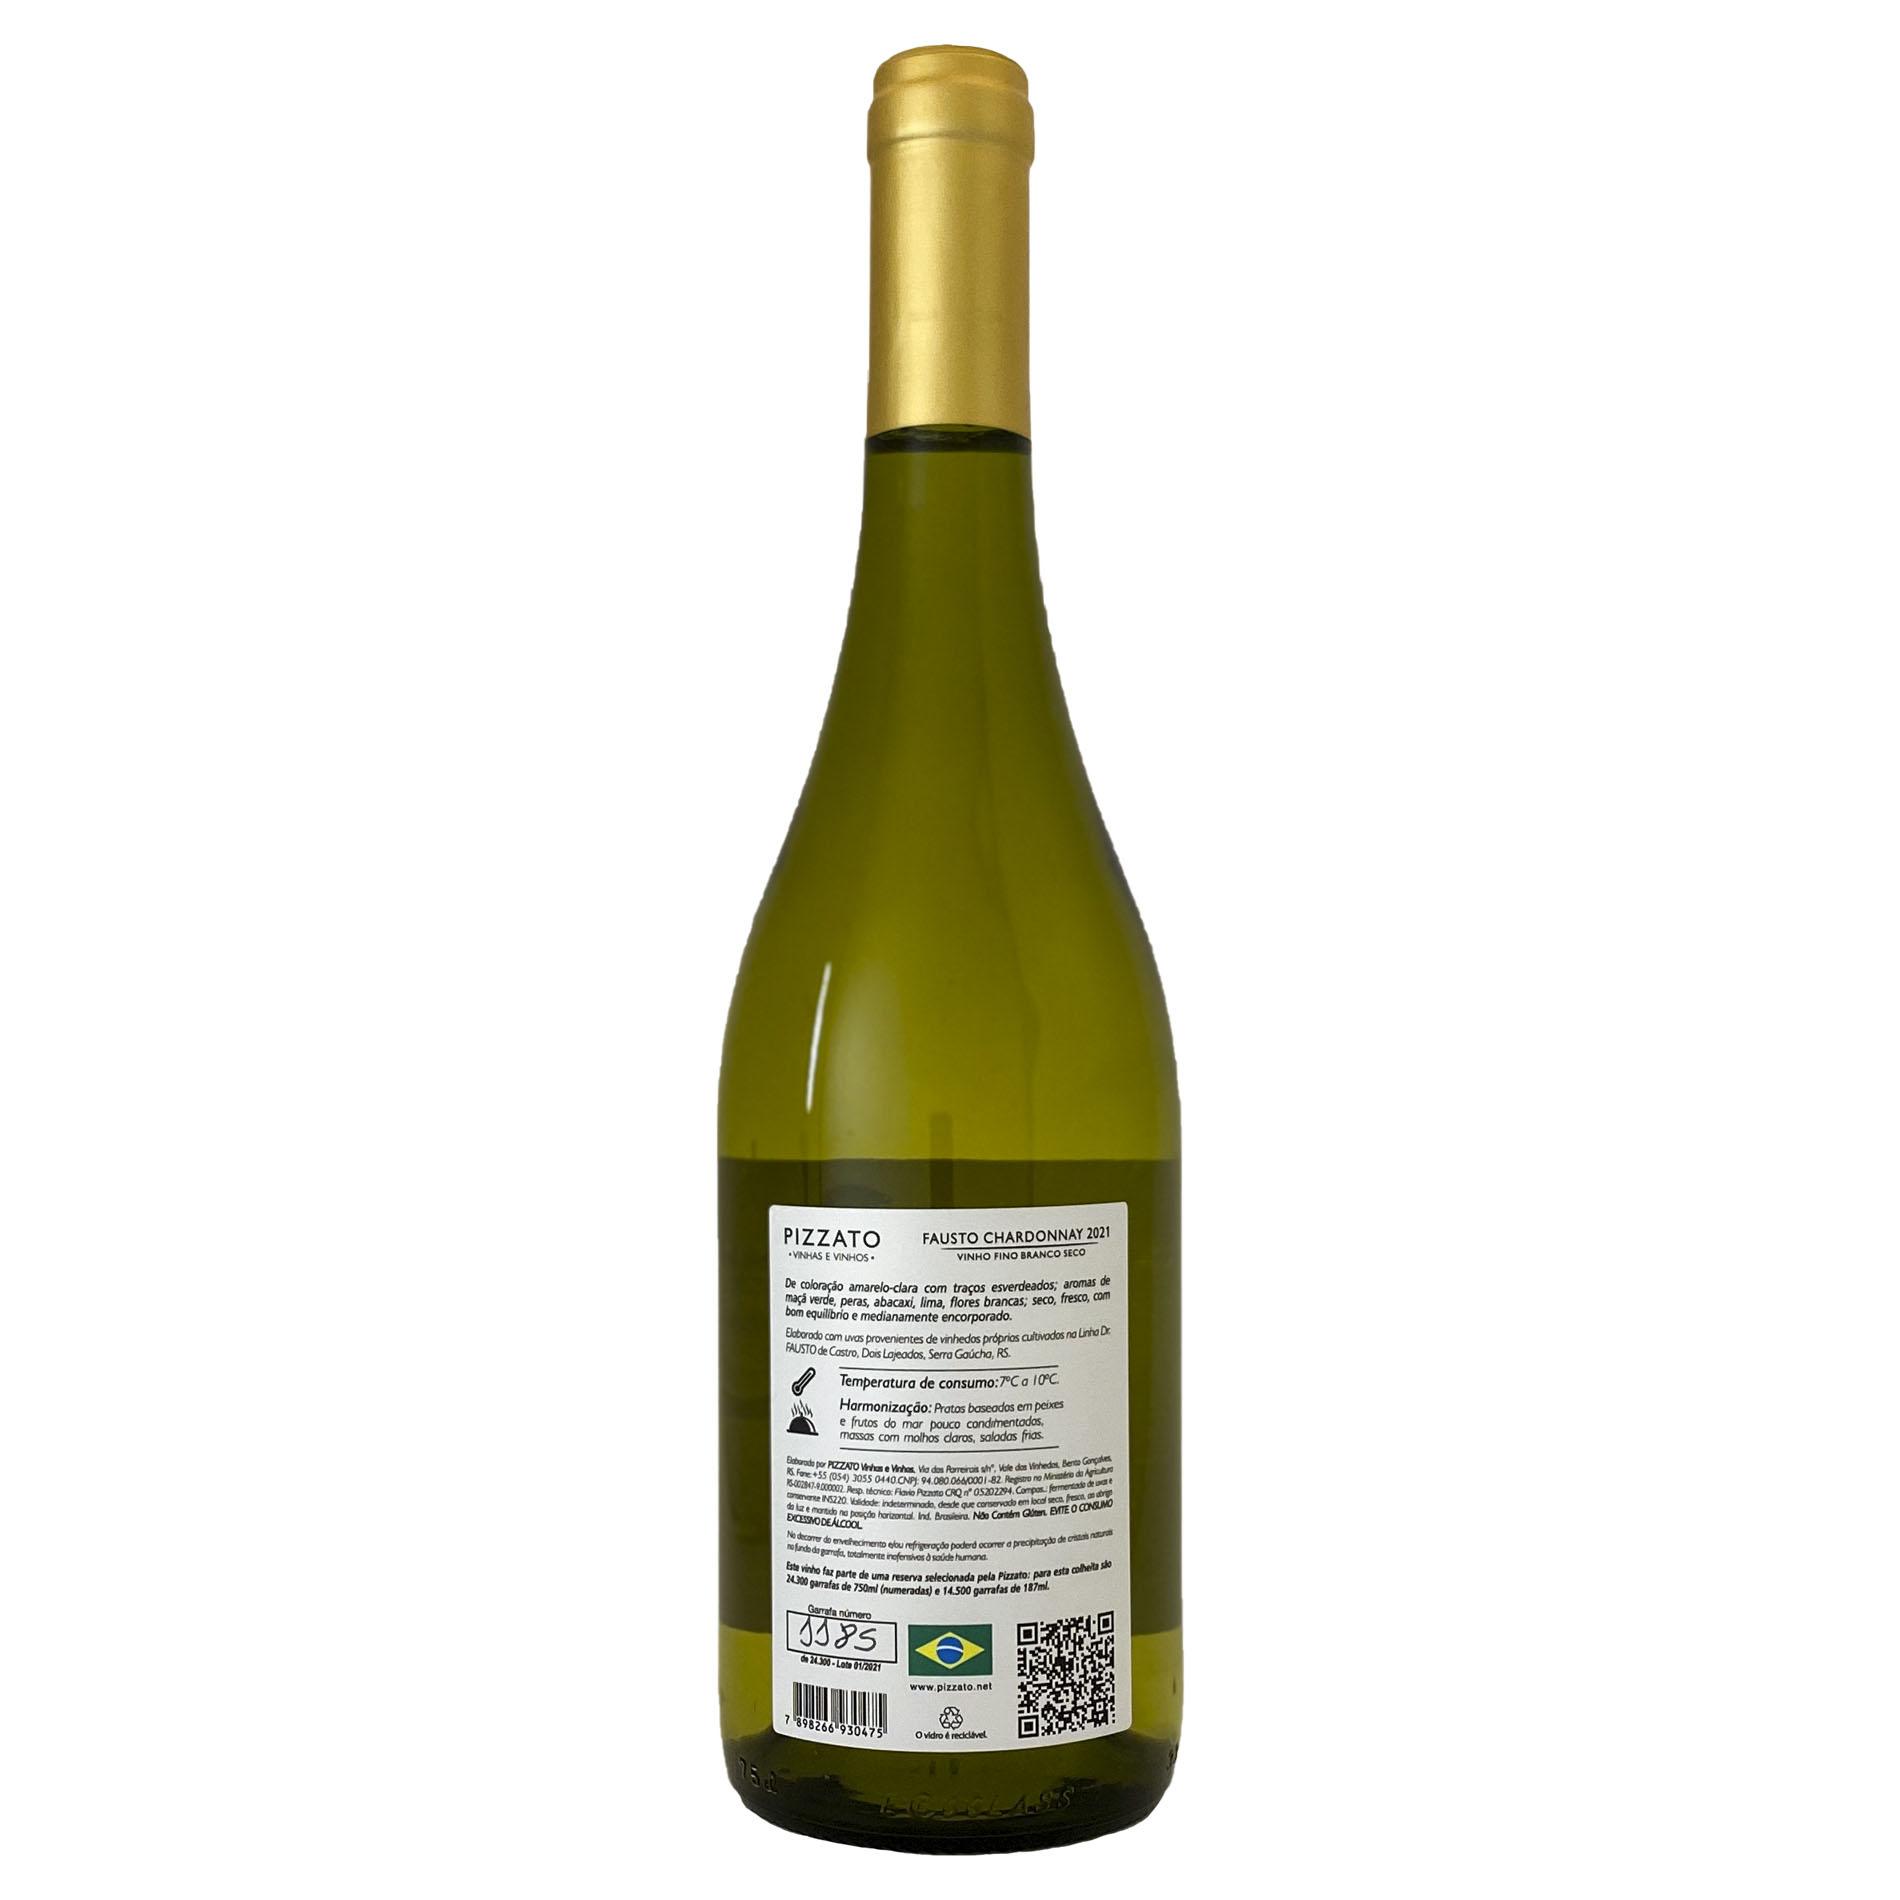 FAUSTO (de Pizzato) Chardonnay  - Vinerize